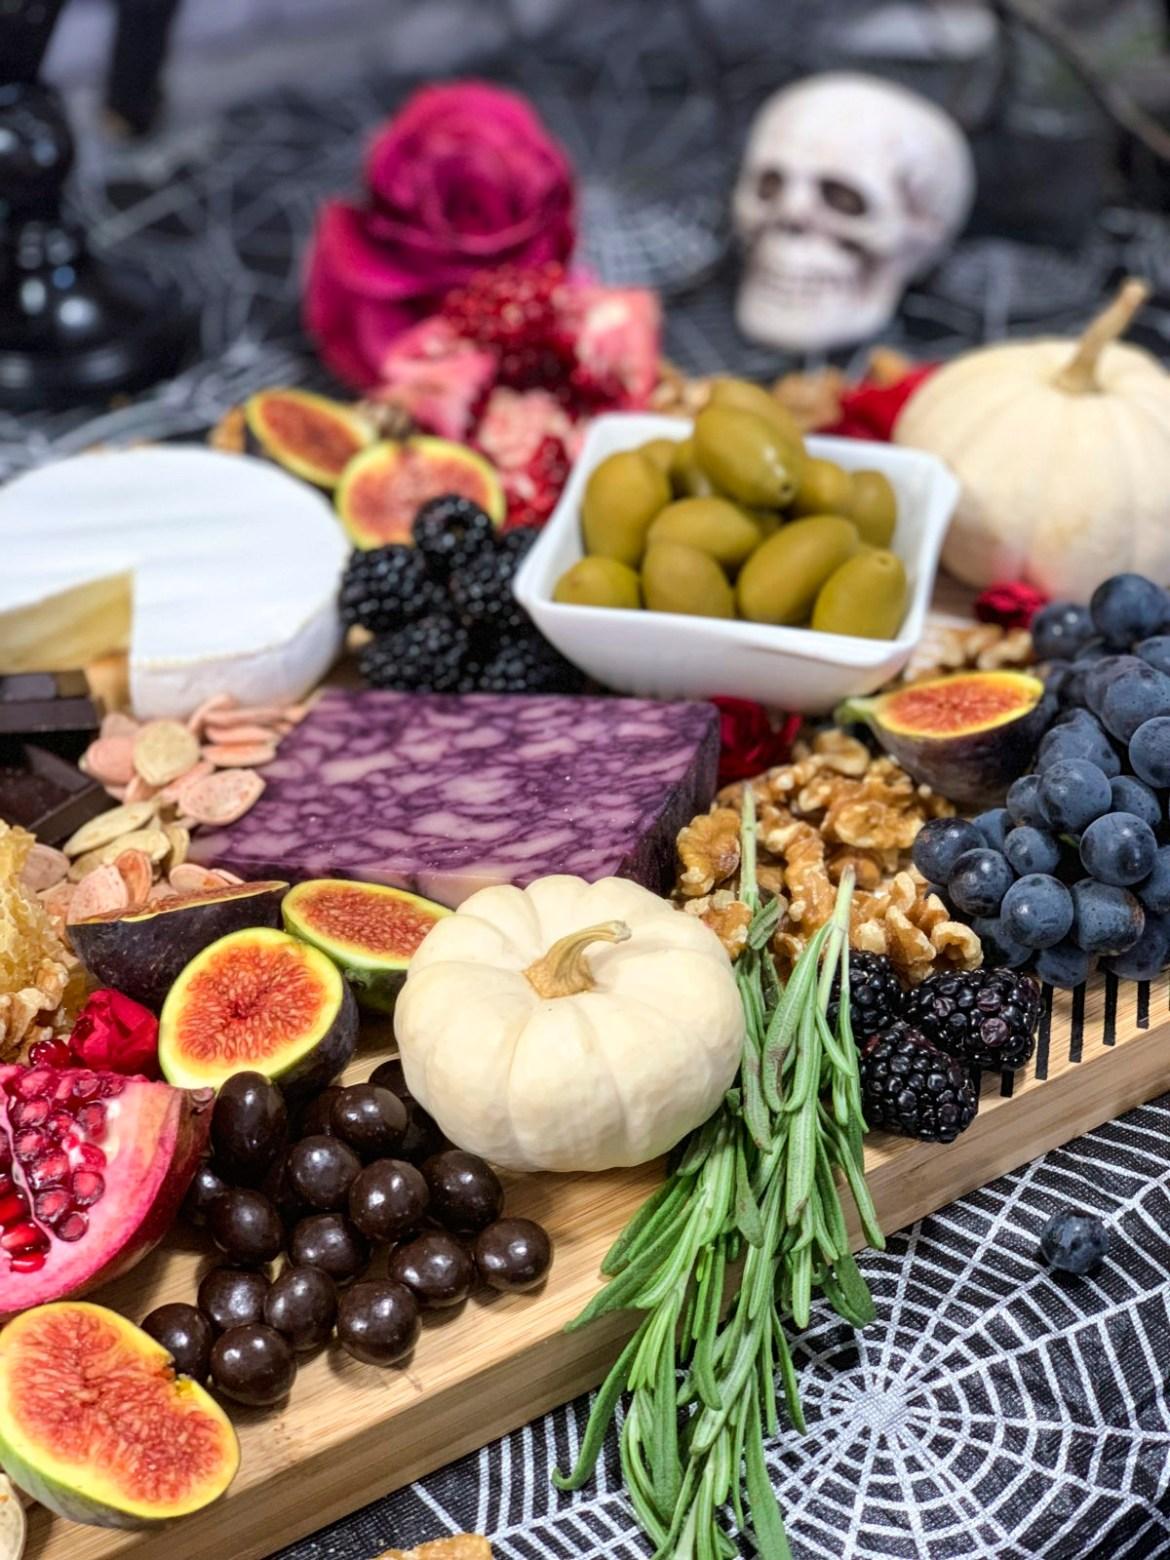 Make a Spooky Halloween Cheese Board